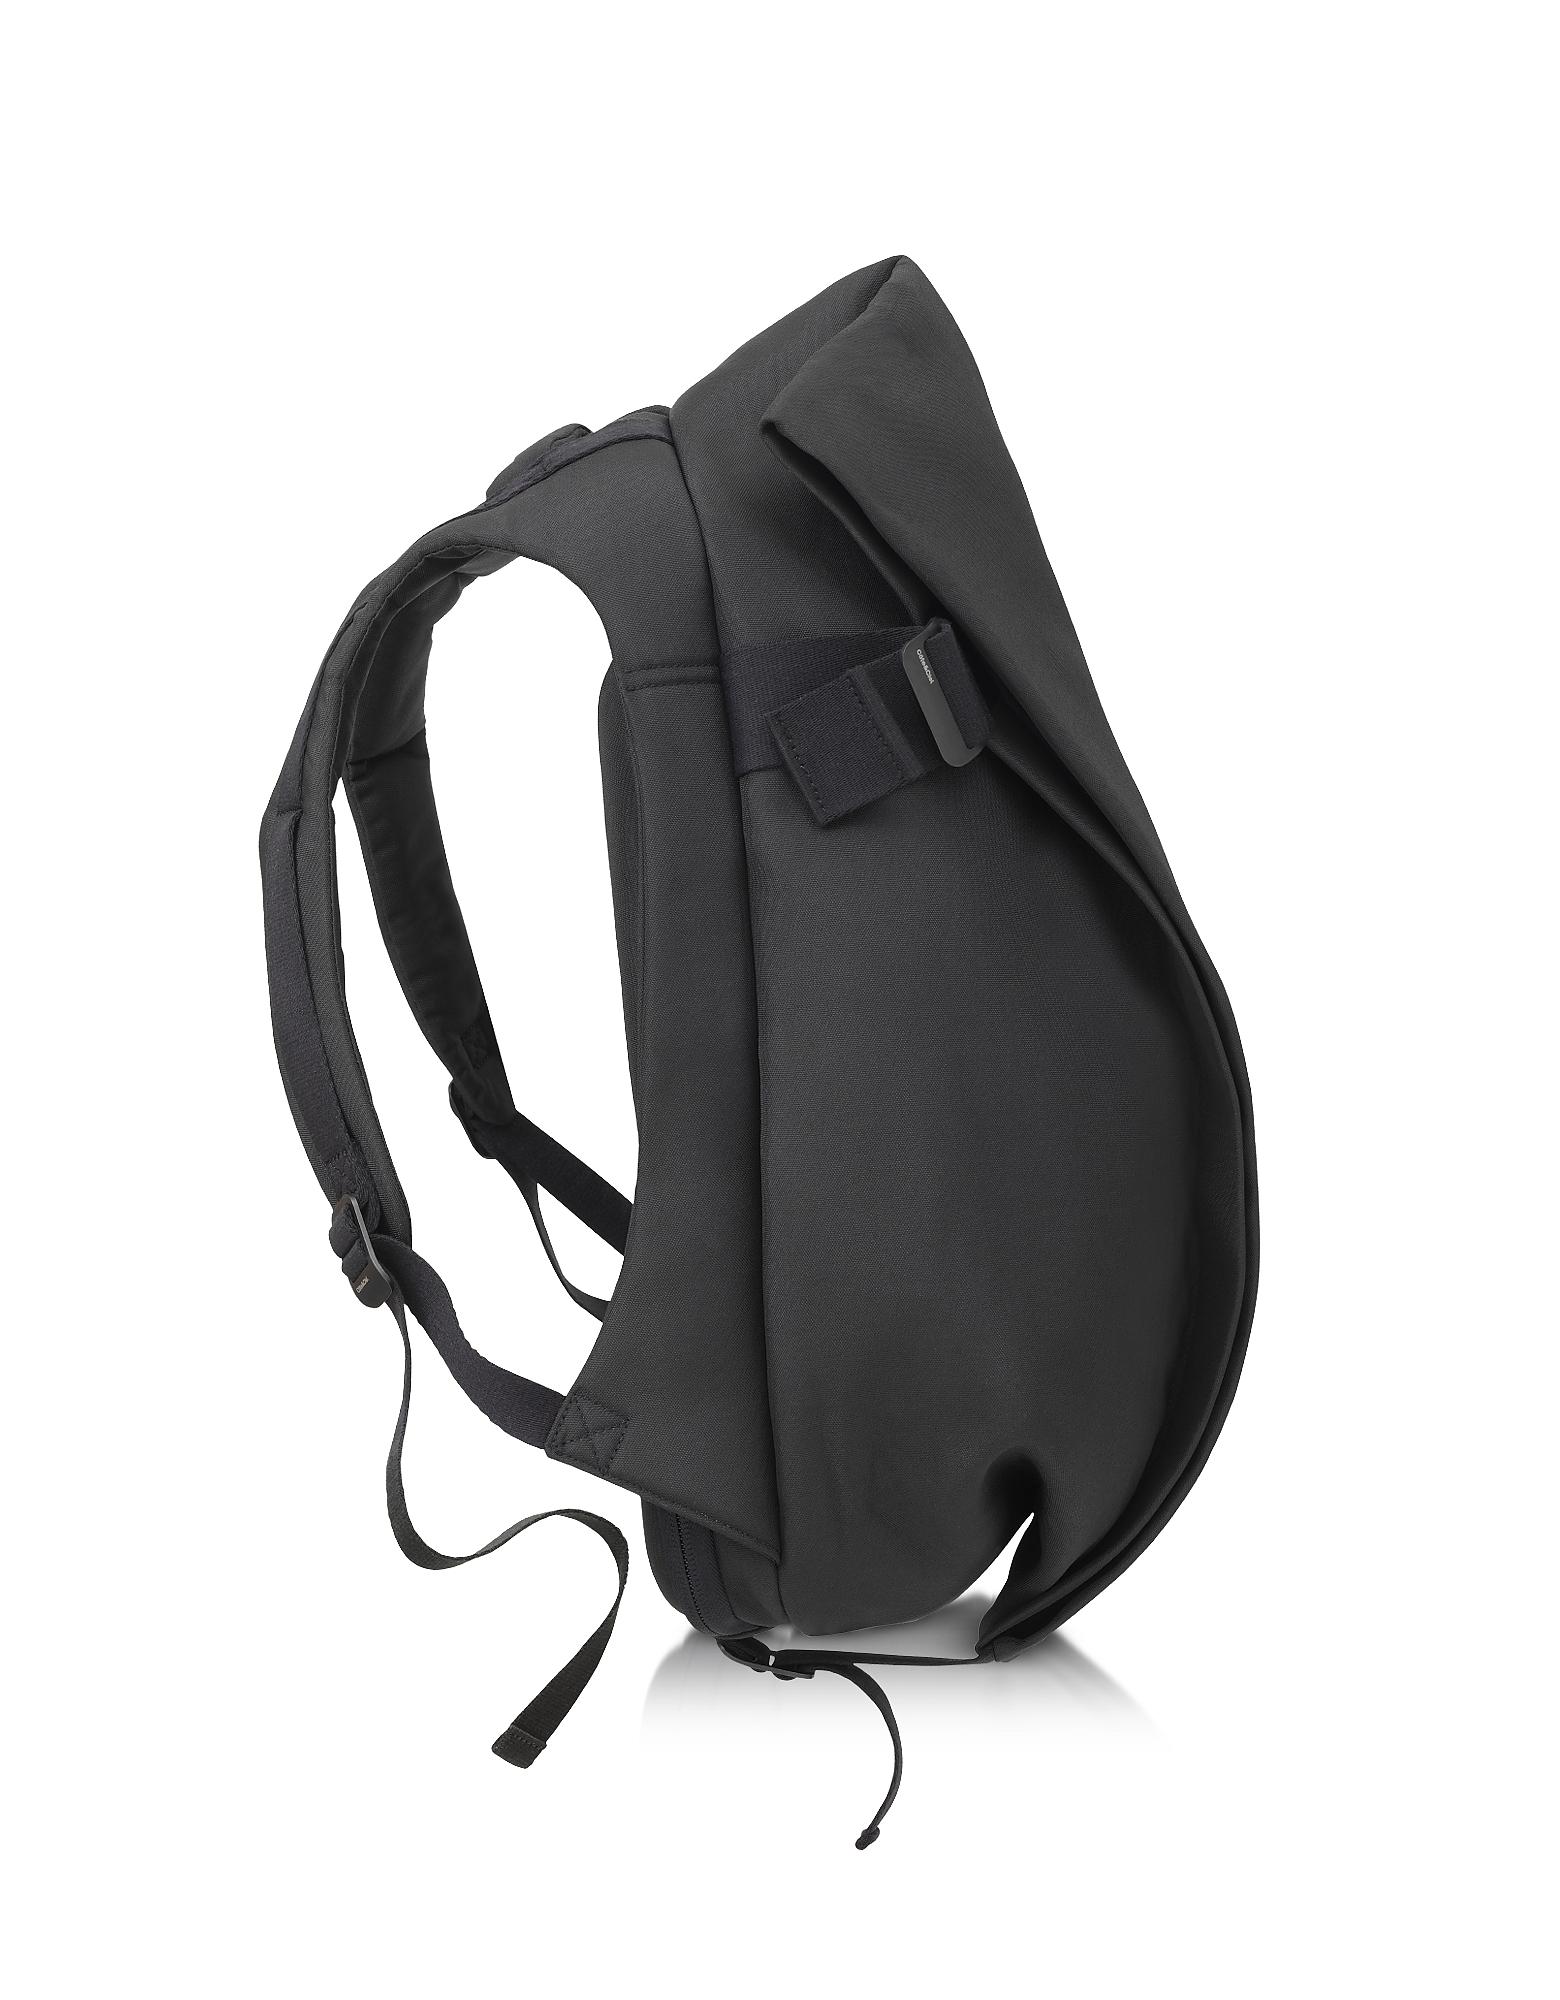 Côte & Ciel Backpacks, Isar Medium Black Eco Yarn Backpack